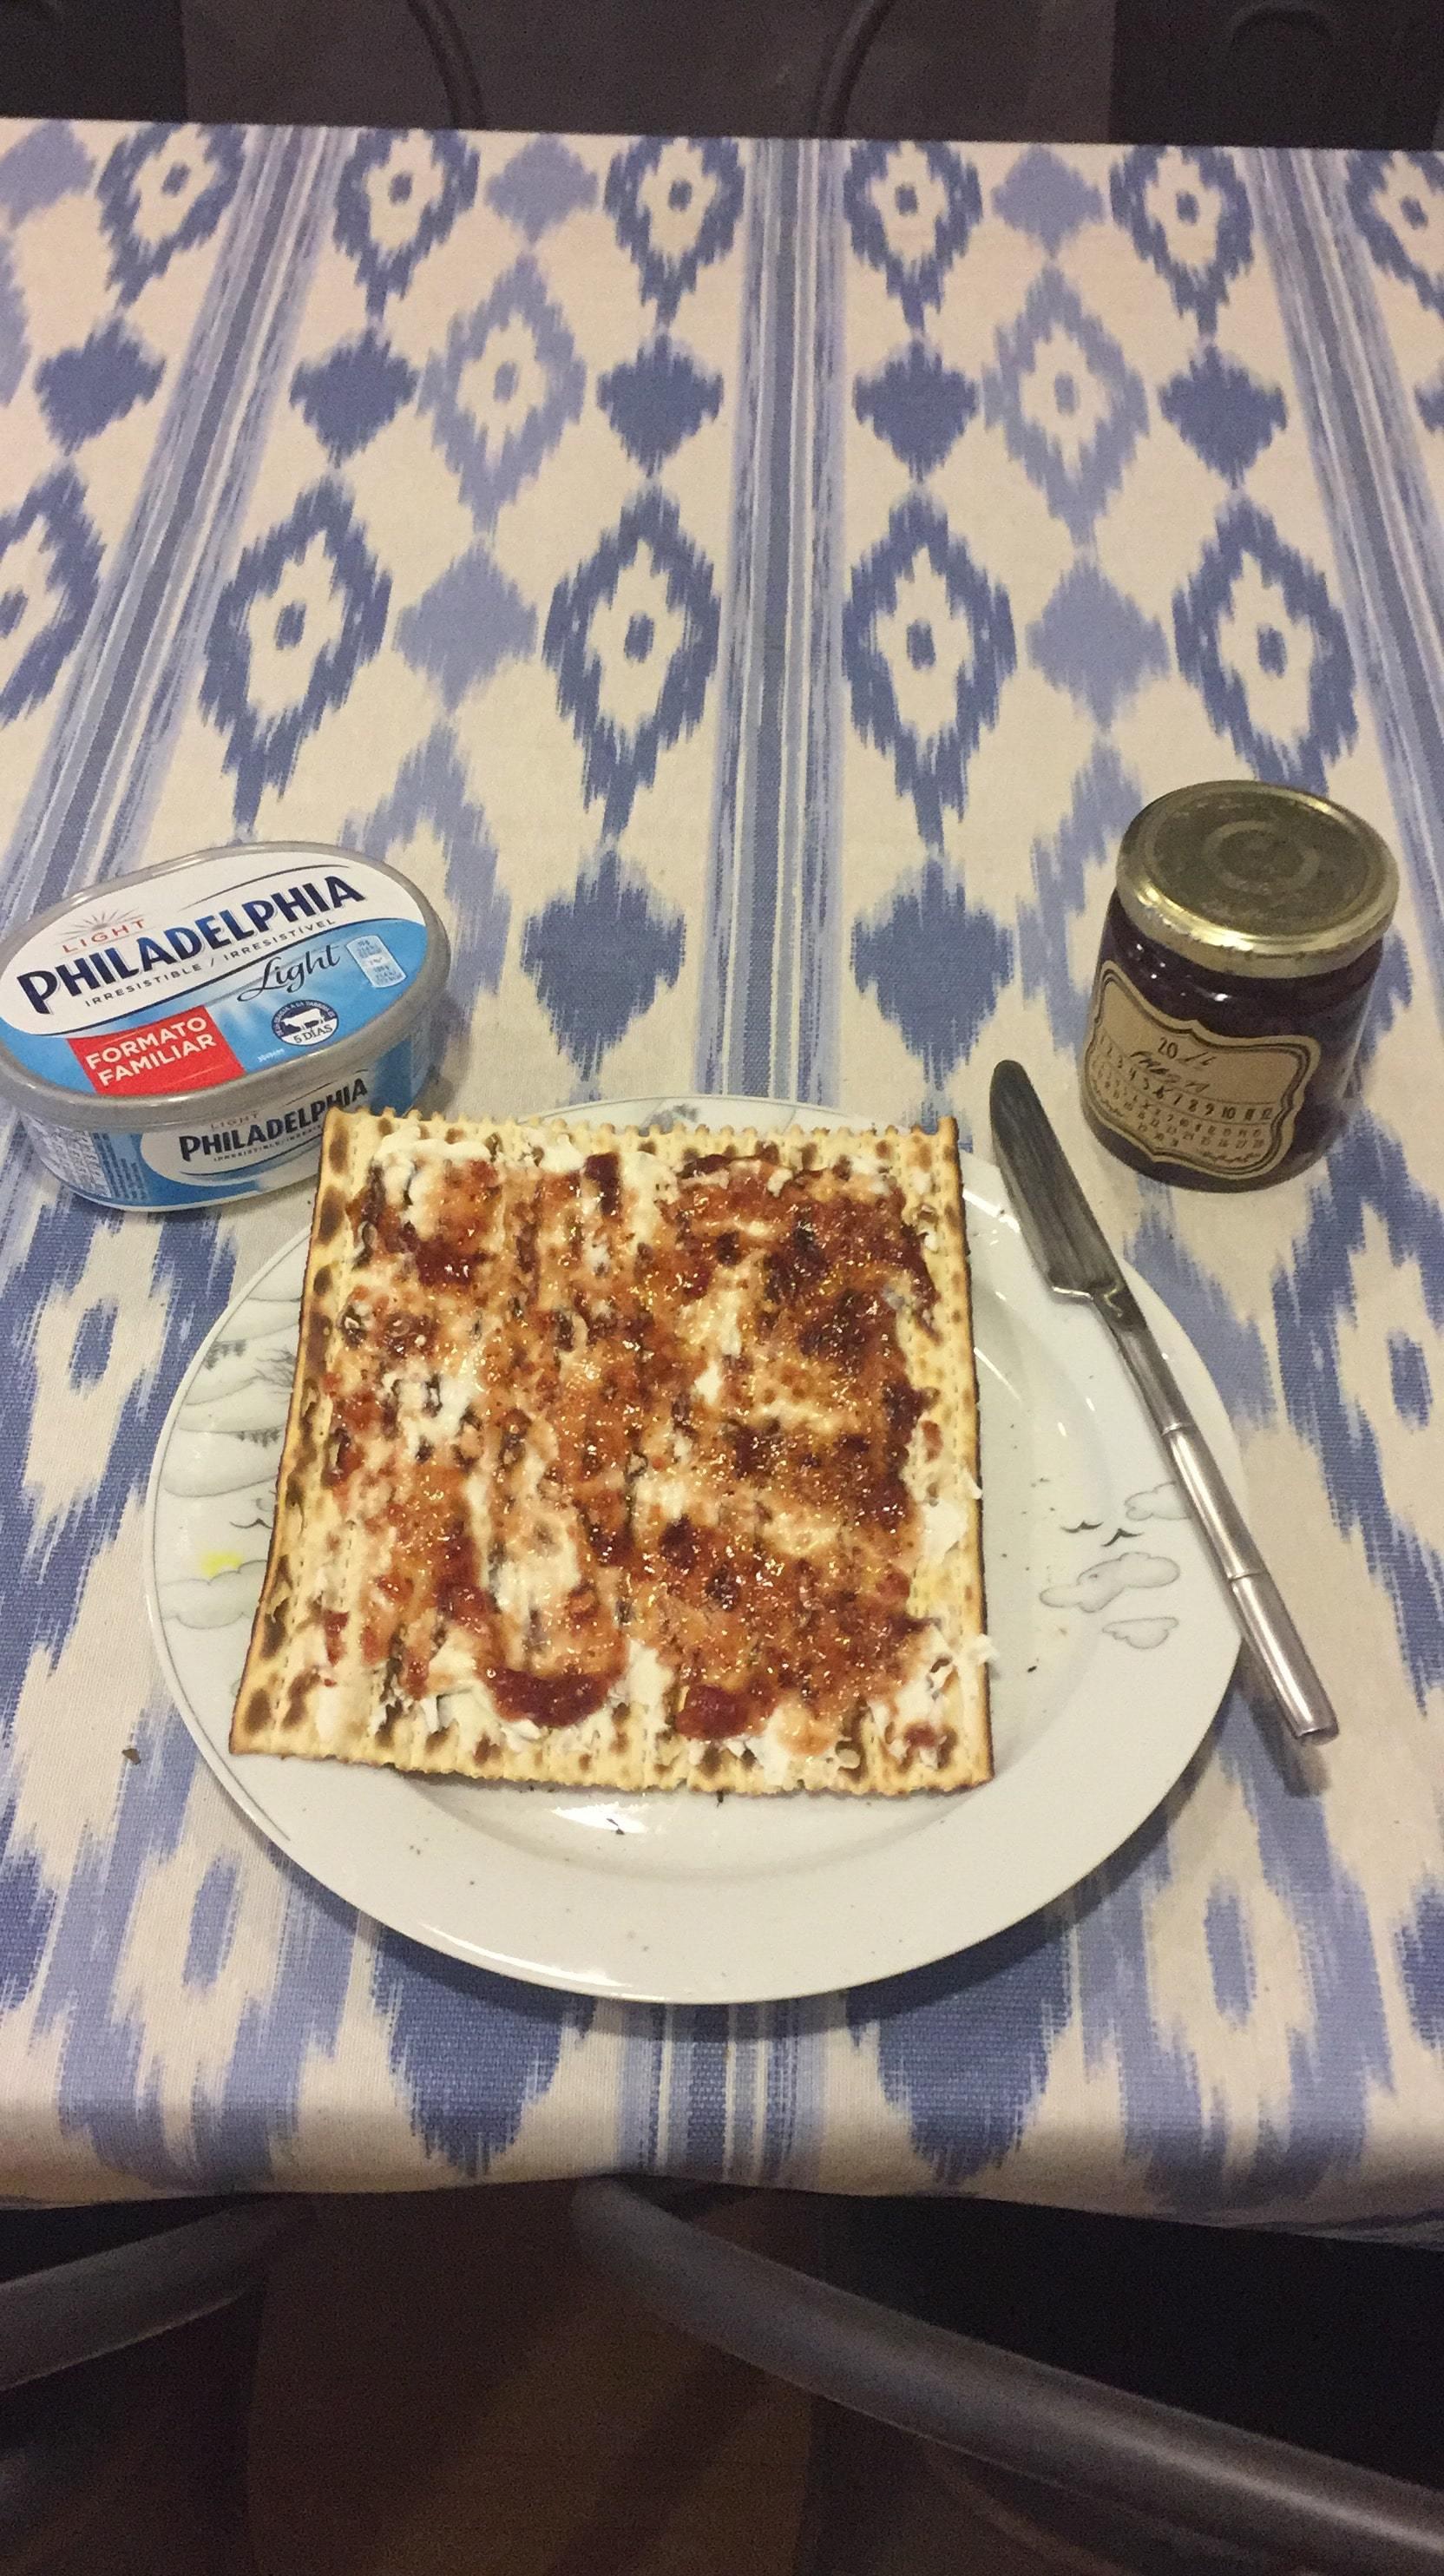 Passover Jewish Celebration IMG 0570 min